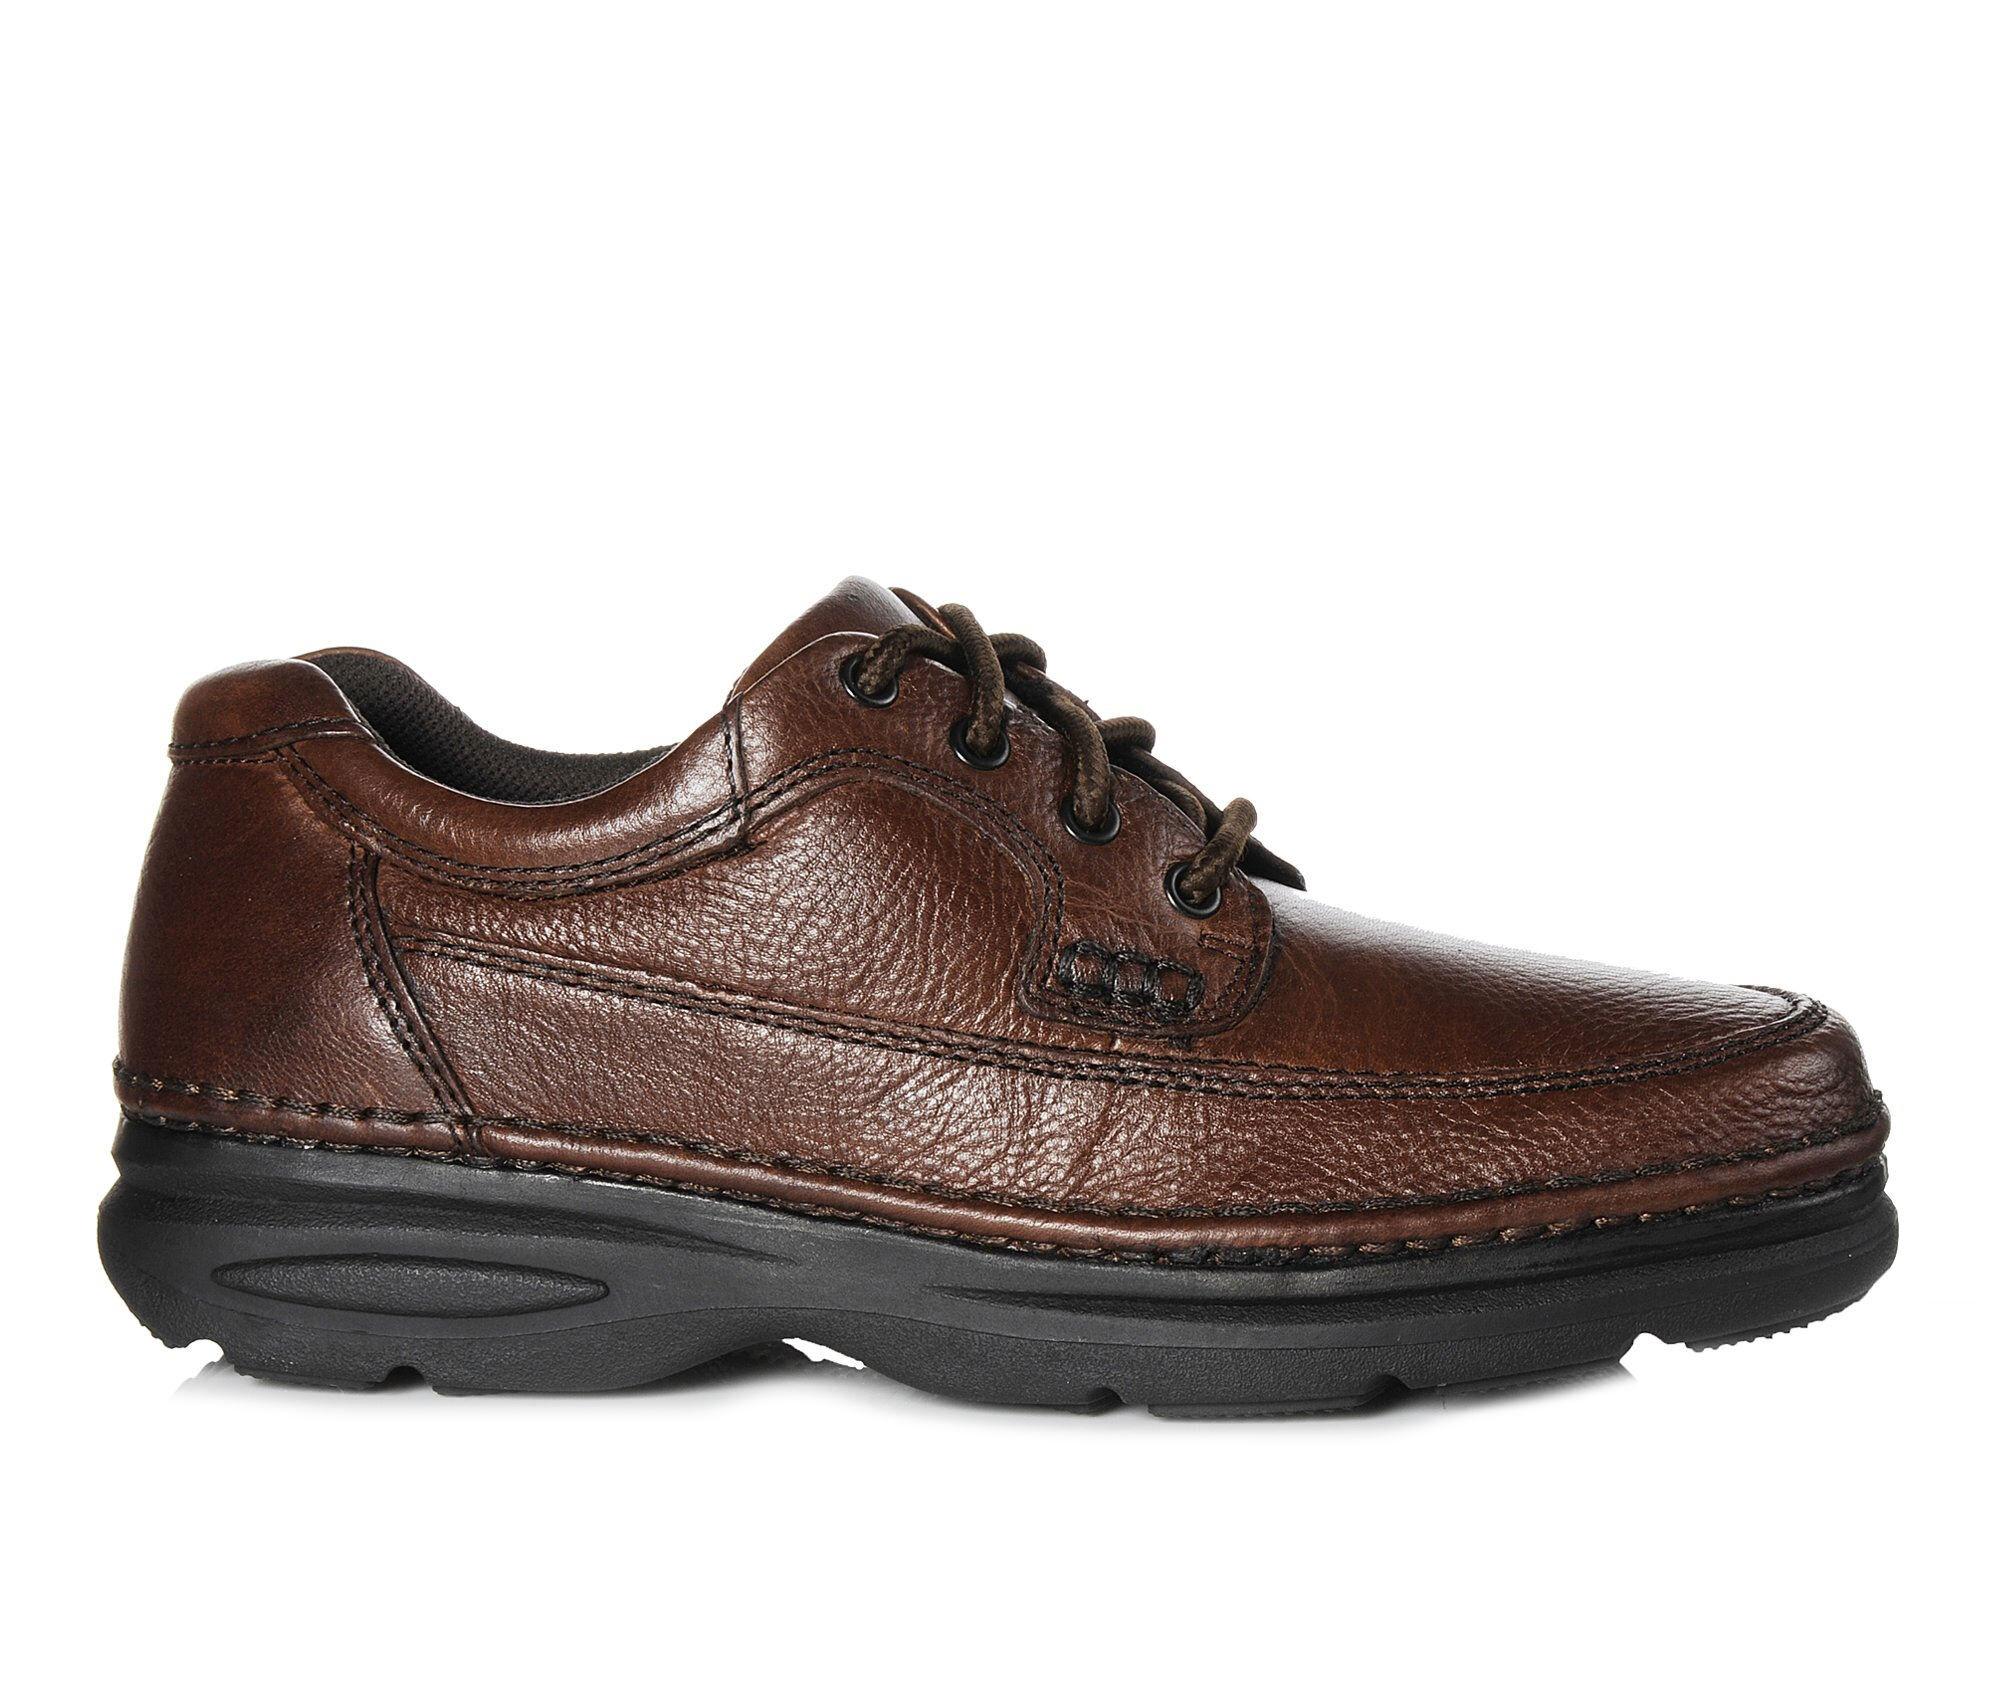 Men's Nunn Bush Philips Plain Toe Oxford Casual Shoes footaction online B84aWgpsp